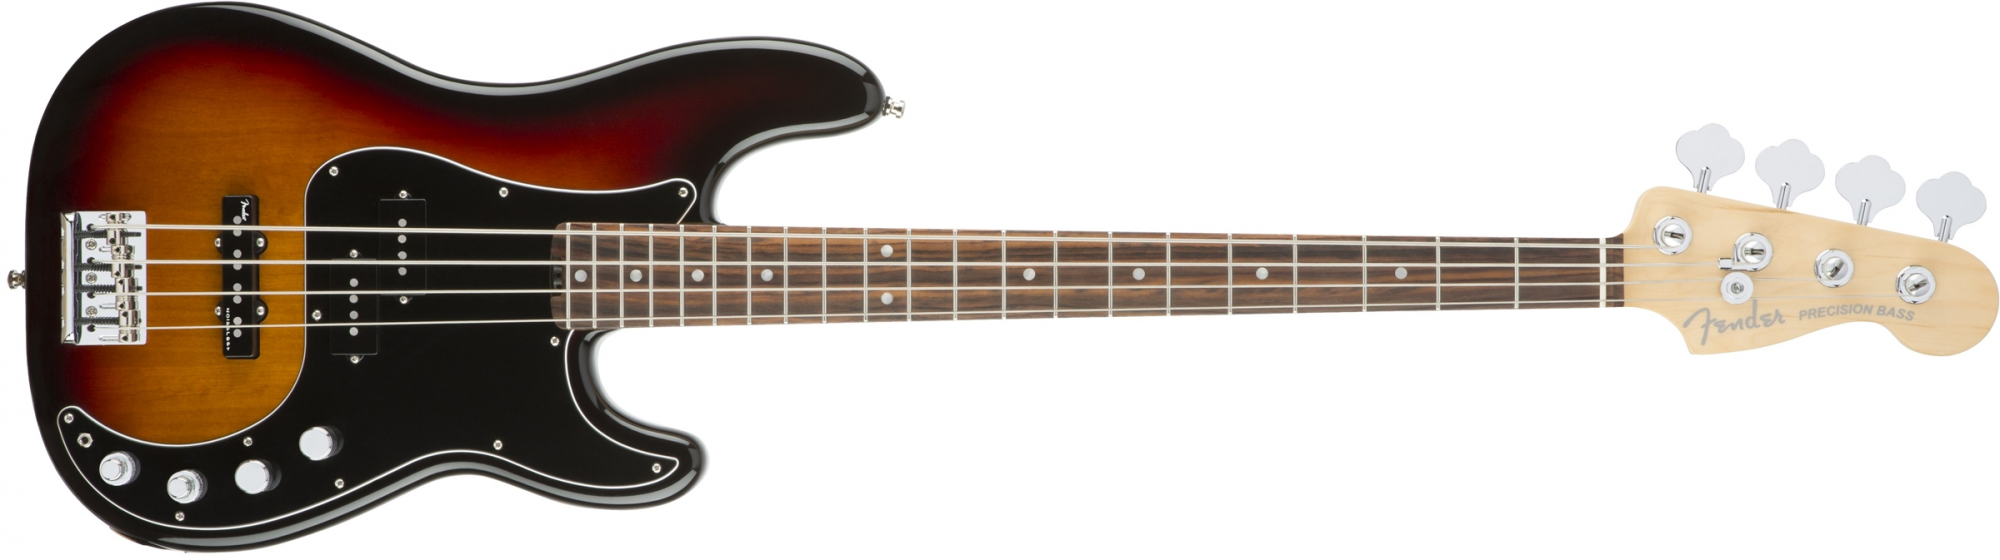 Fender American Elite Precision Bass 3 Color Burst